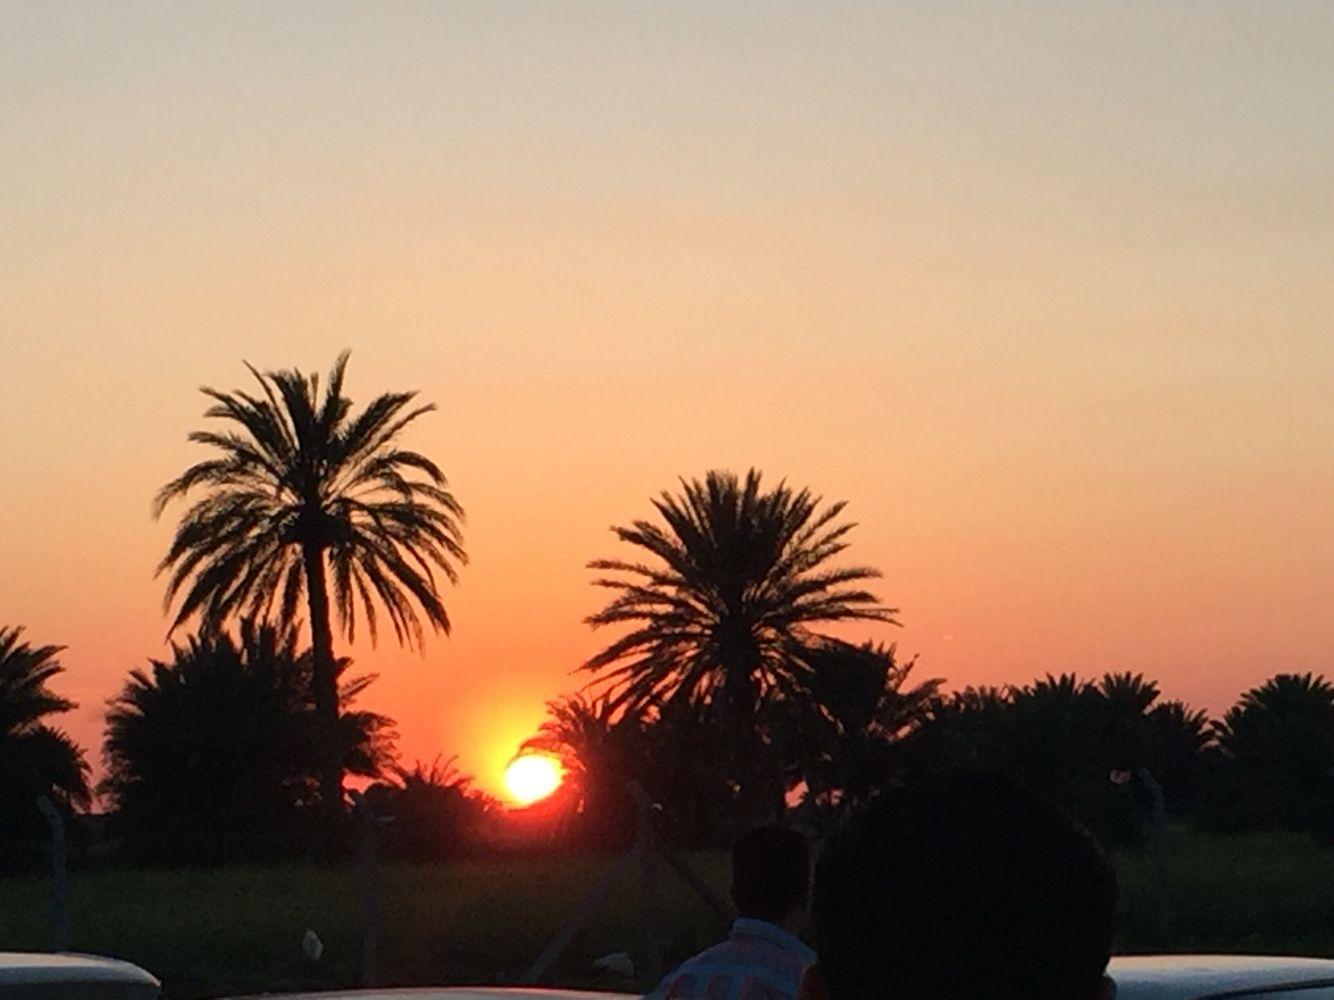 غروب الشمس في بلادي Sunset Celestial Outdoor